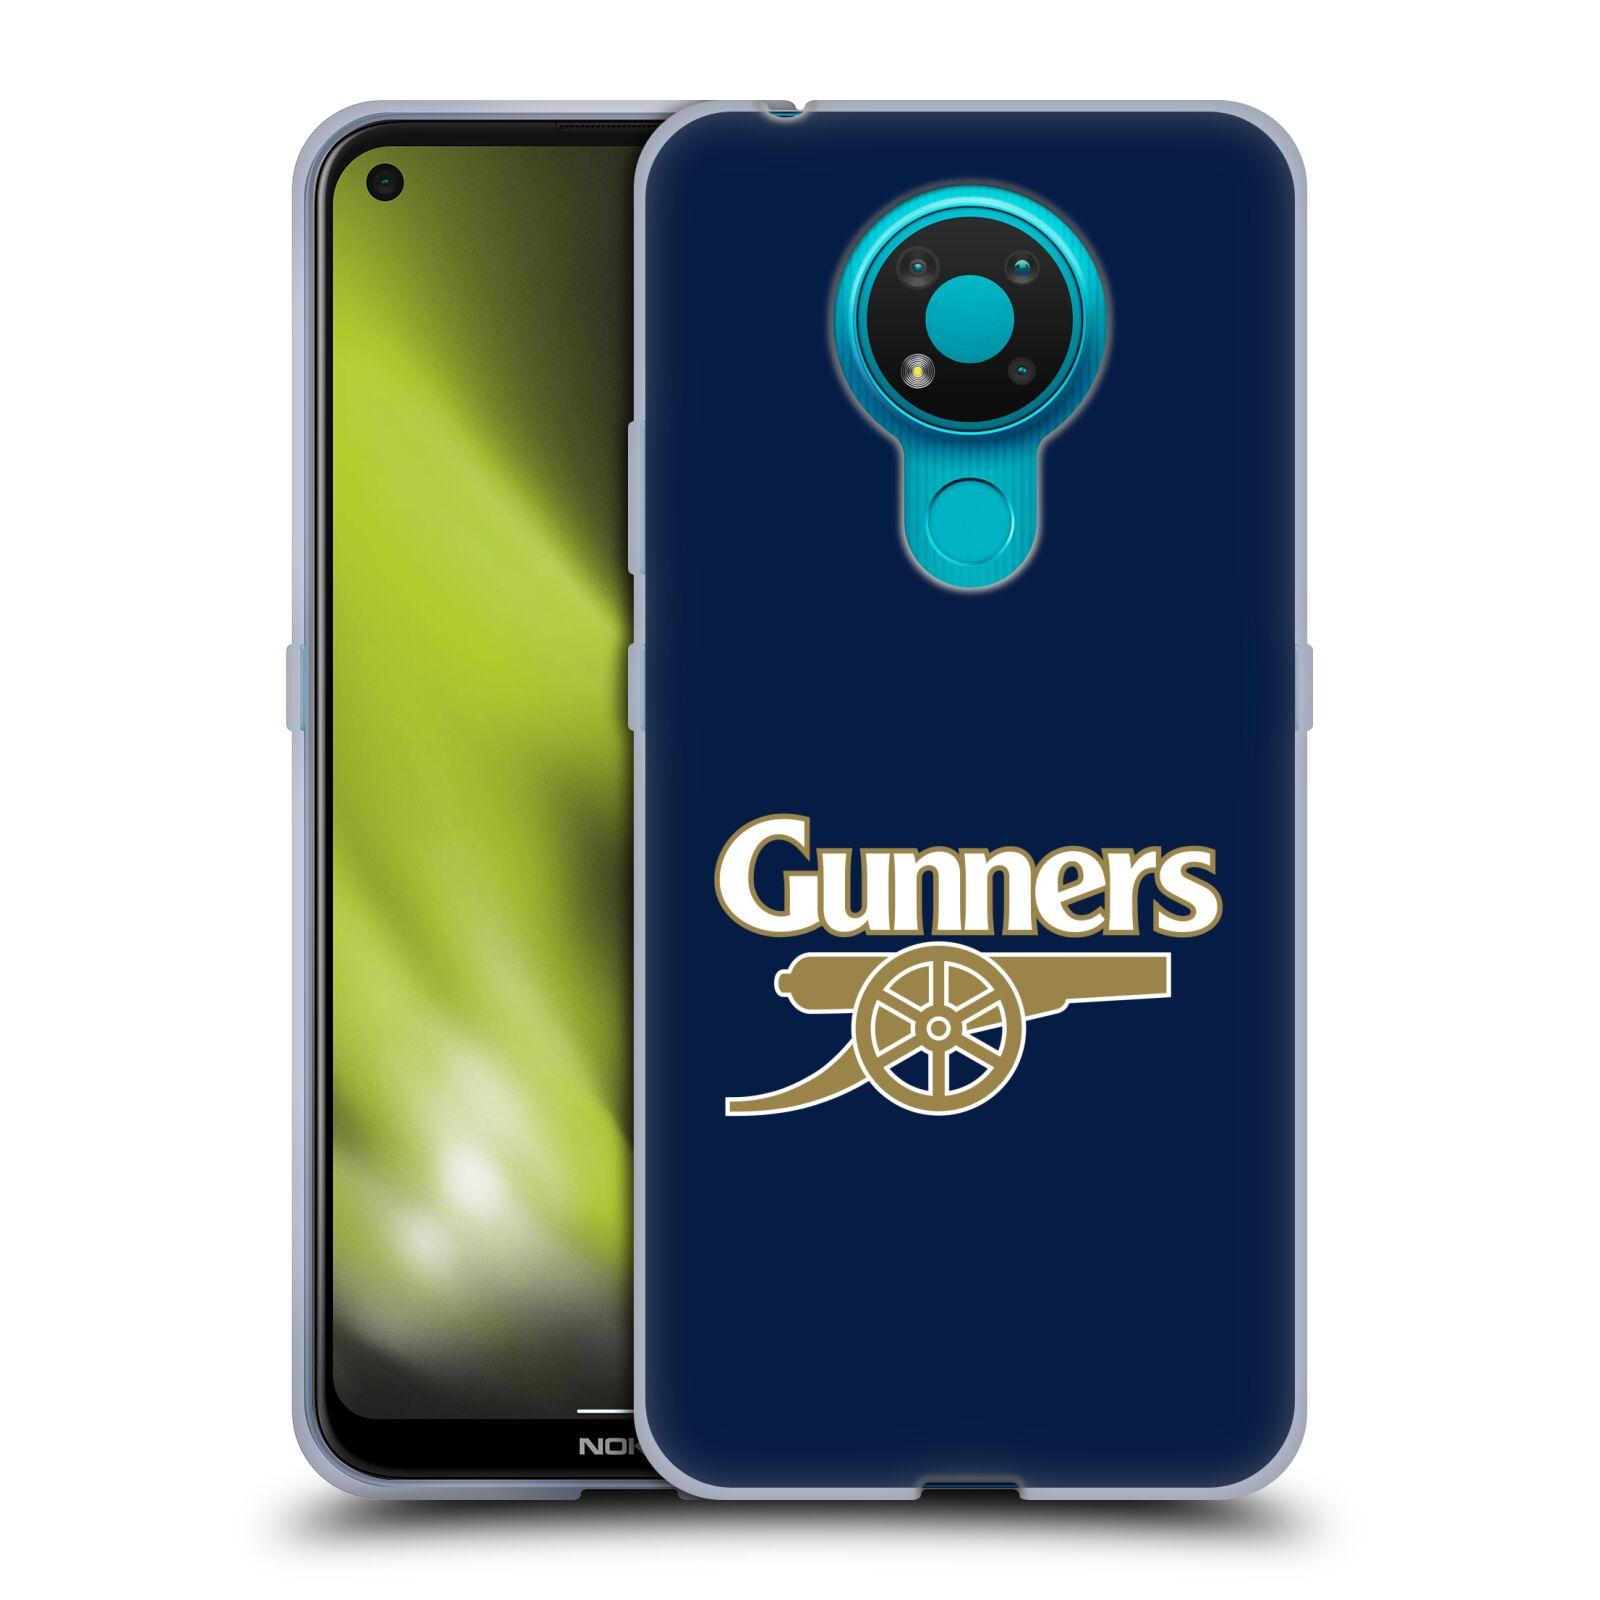 Silikonové pouzdro na mobil Nokia 3.4 - Head Case - Arsenal FC - Gunners